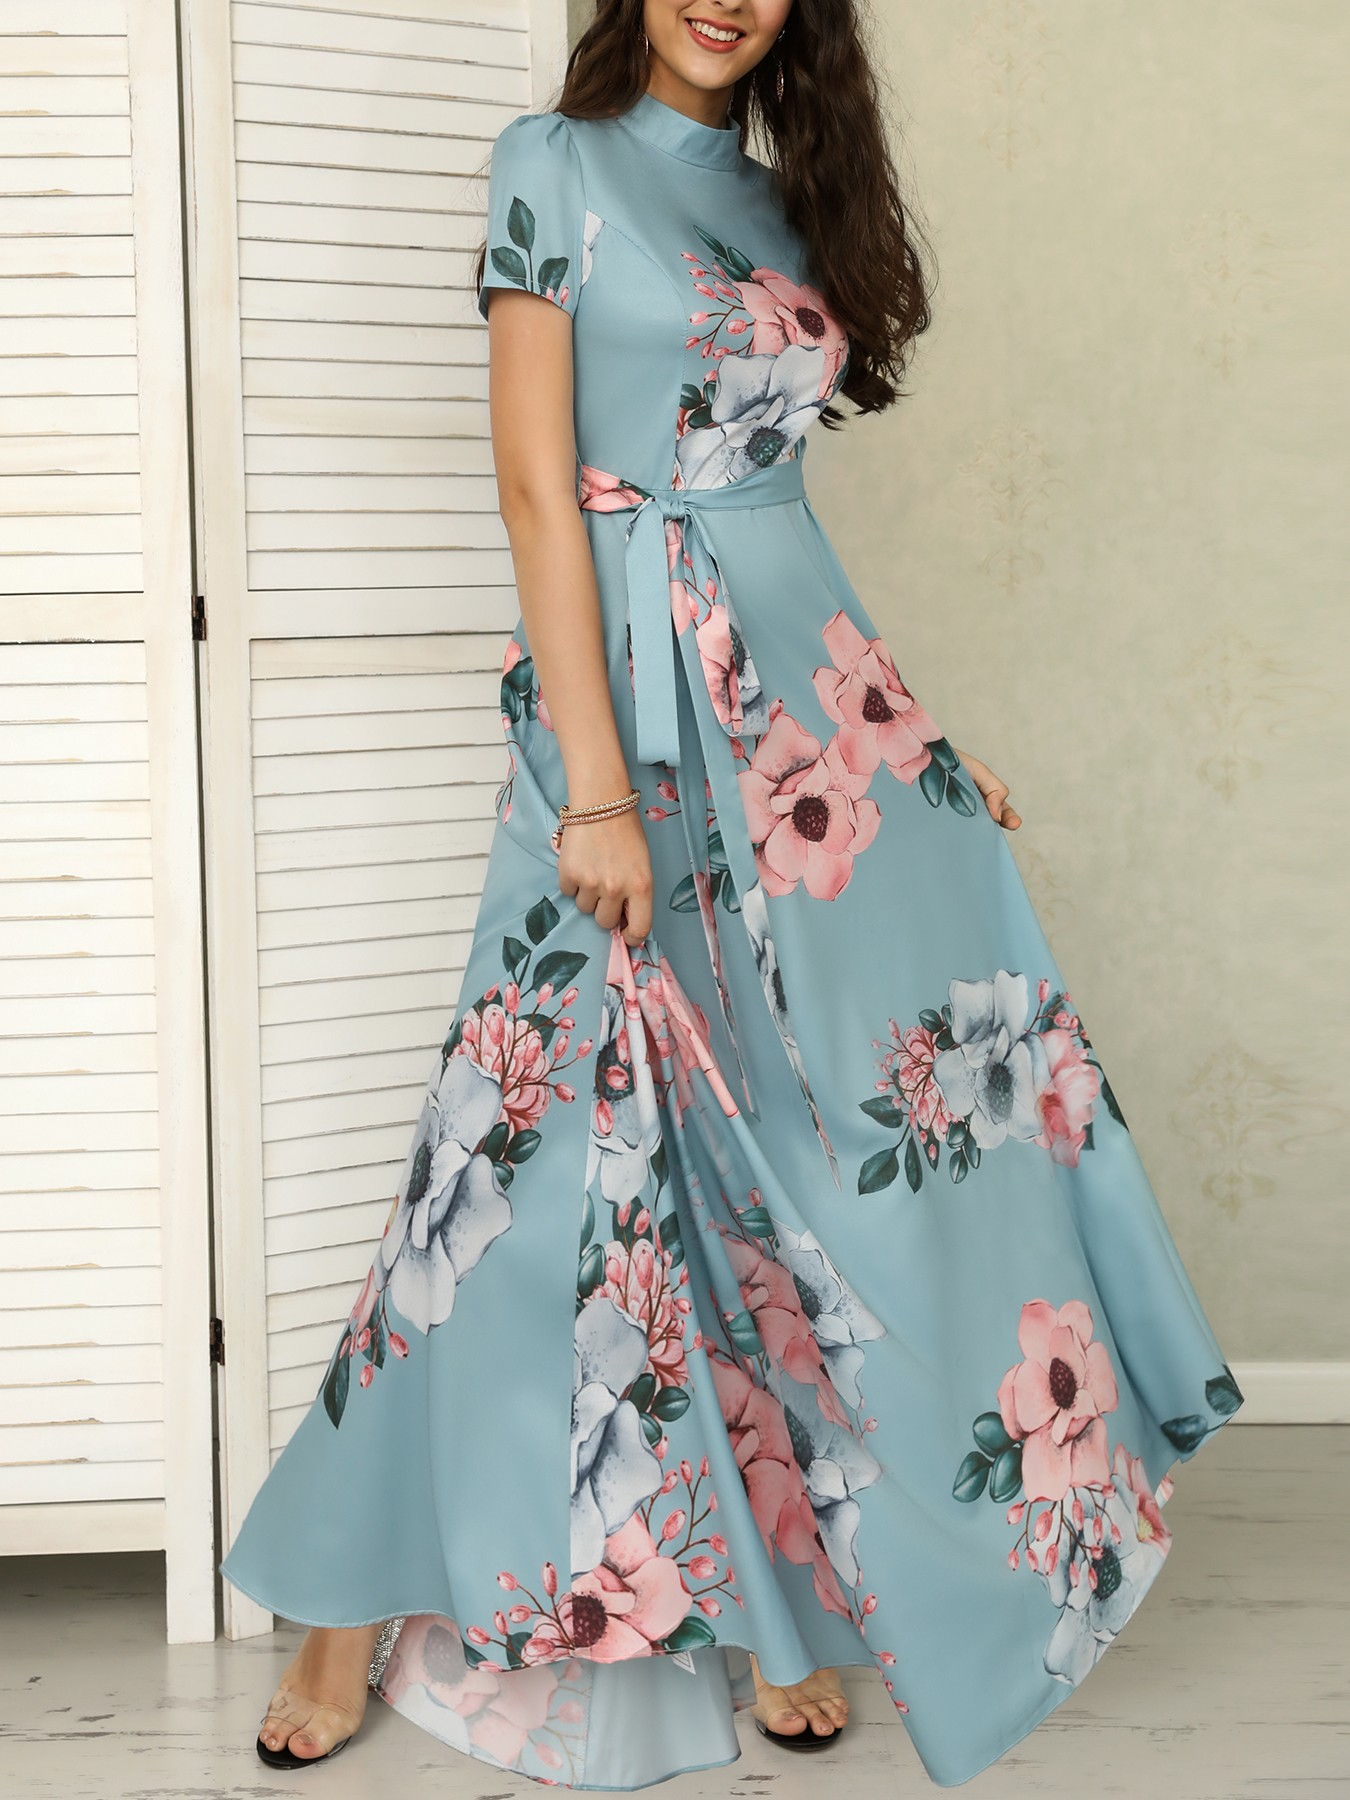 boutiquefeel / Floral Print Short Sleeve Tie Waist Maxi Dress